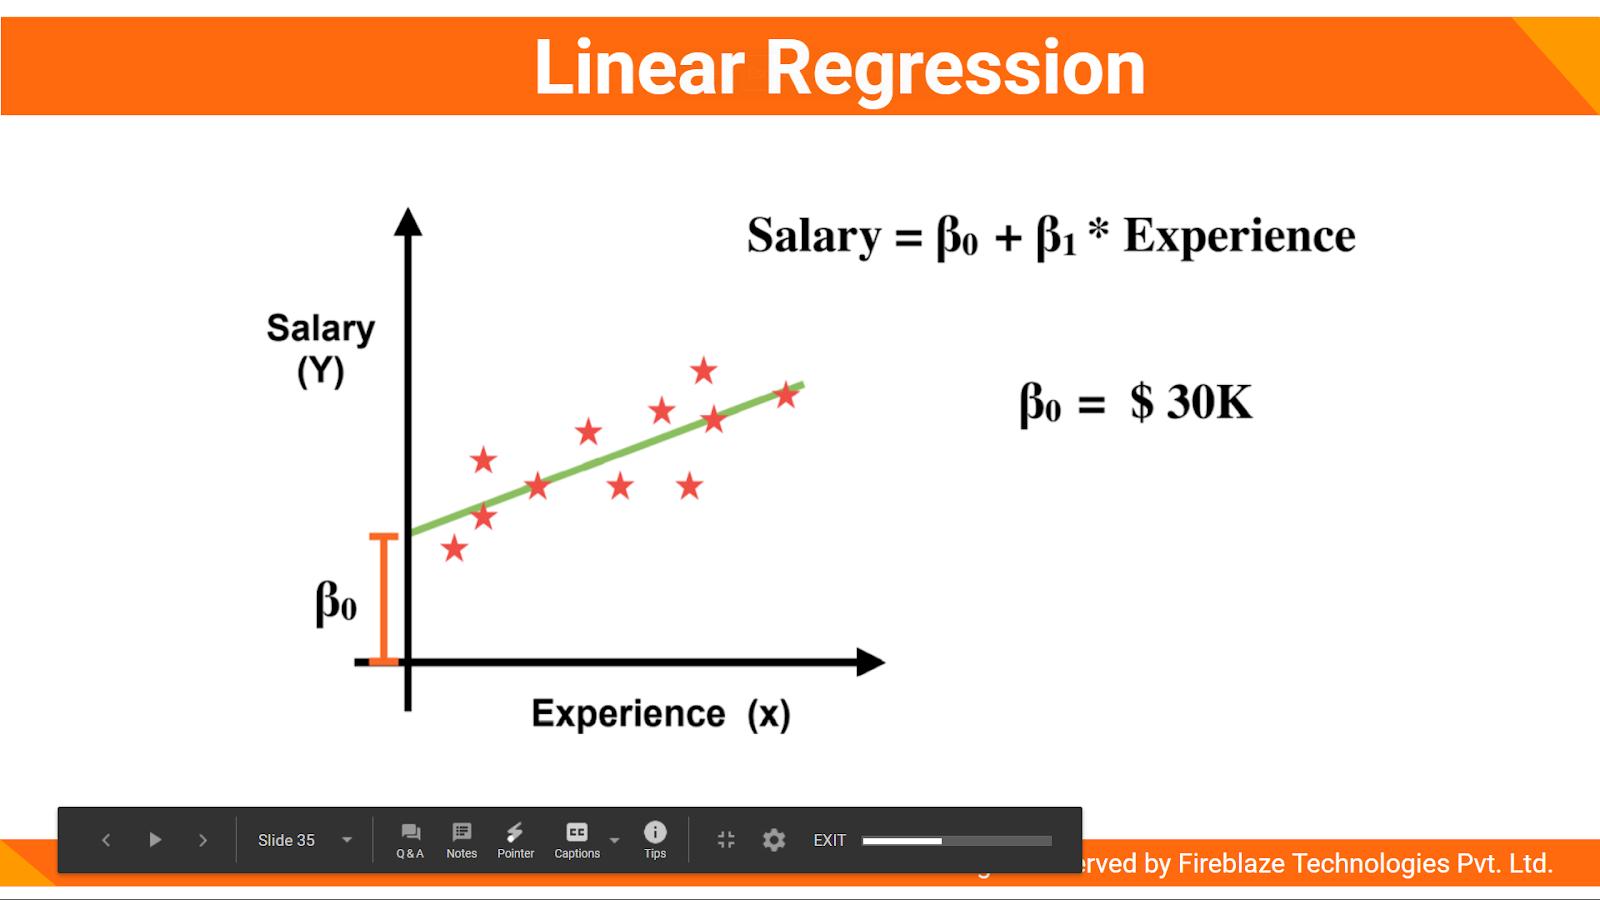 Linear Regression Algorithm in Machine Learning